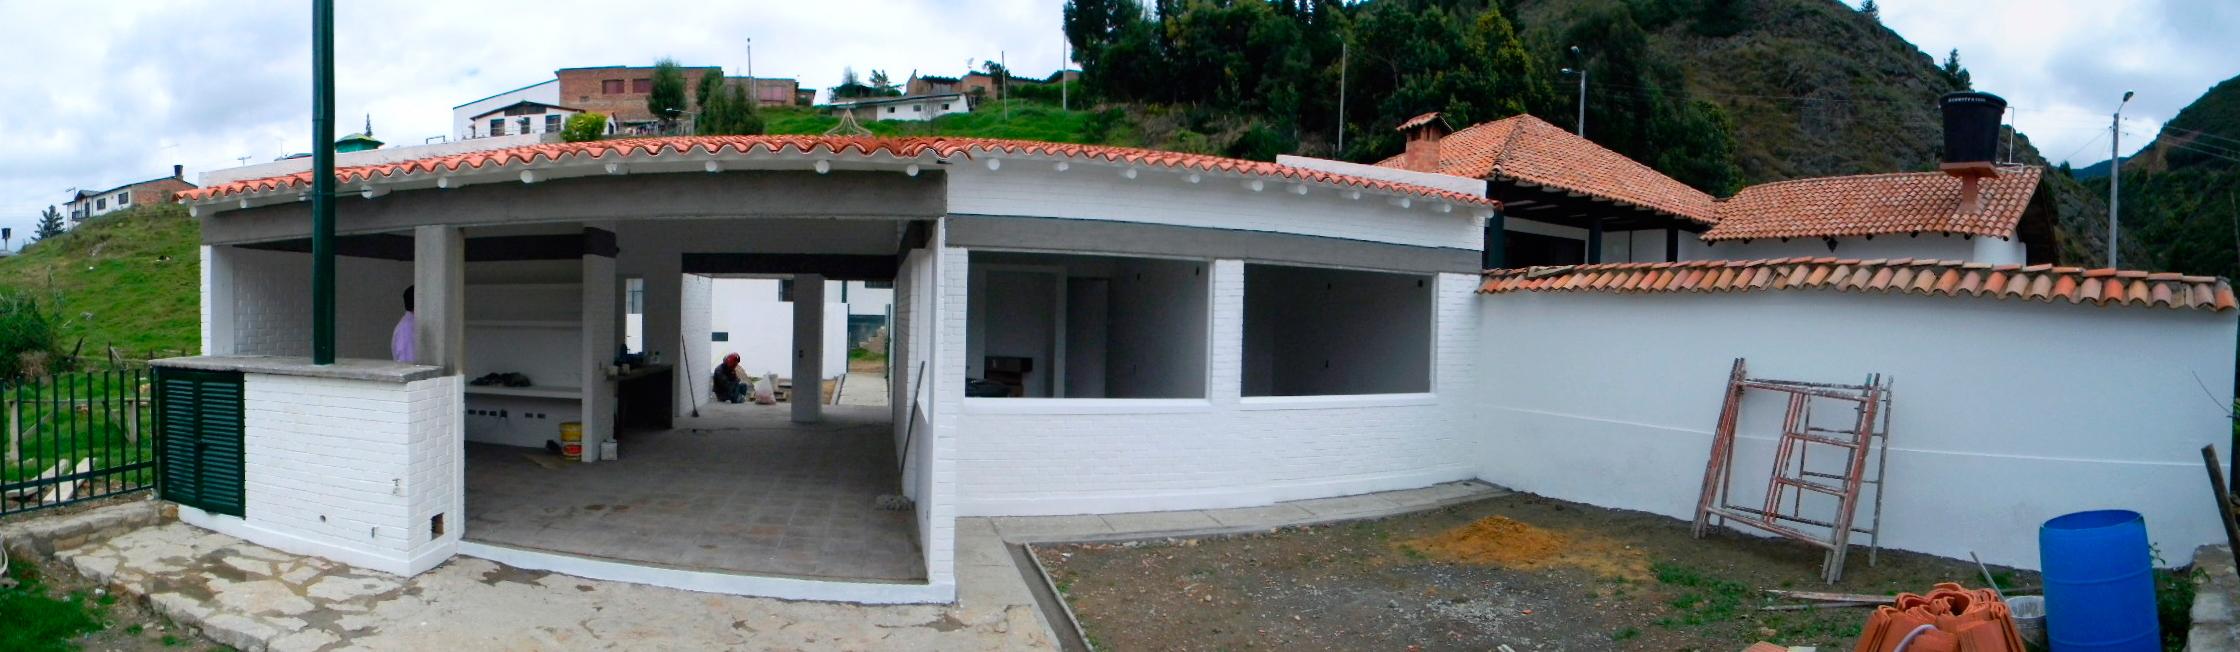 Panorama-35.jpg